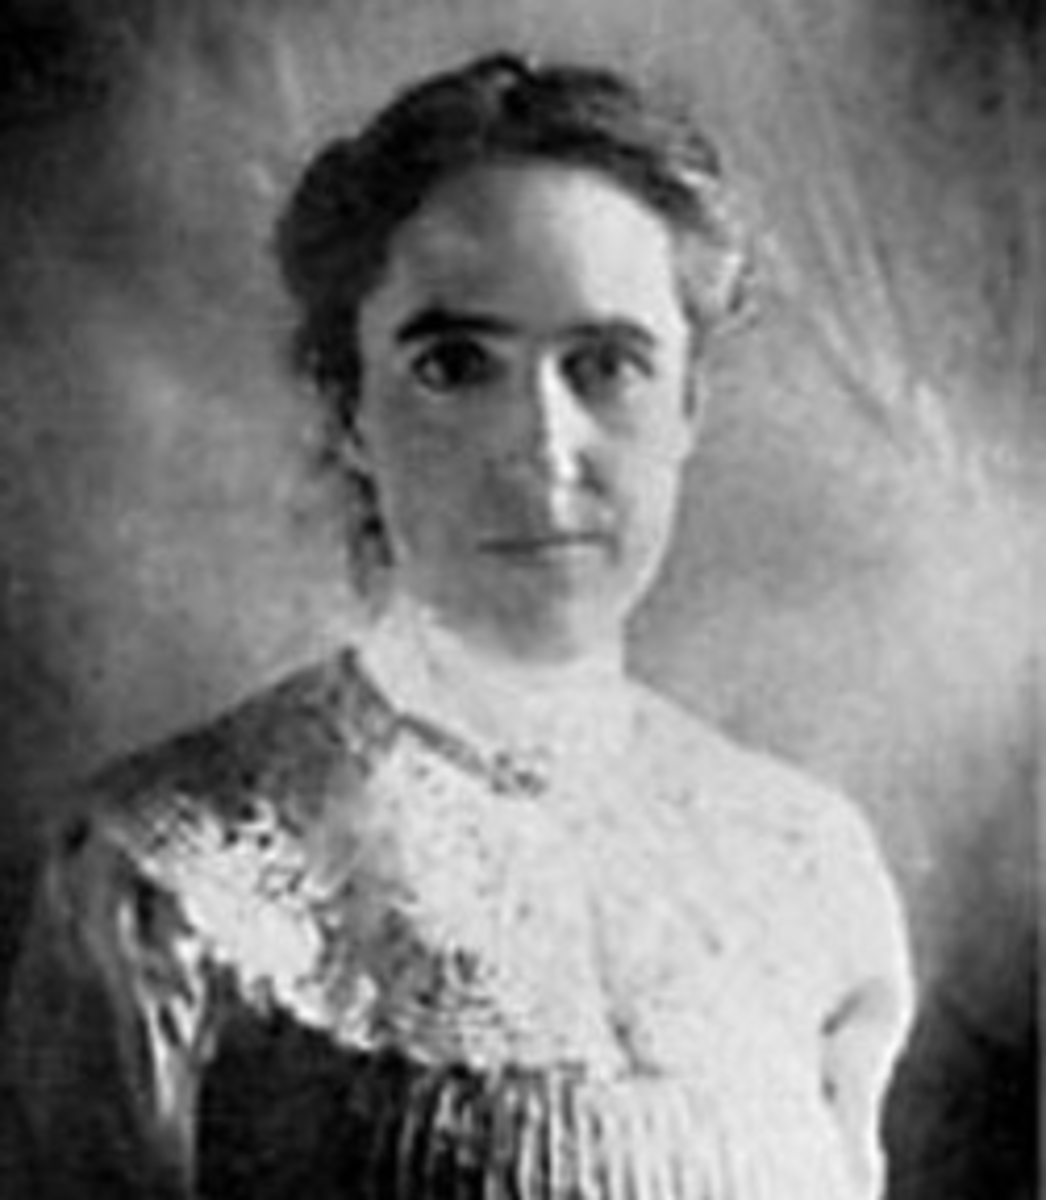 Sybil Ludington- Rode 40 miles to warn Revolutionaries that the British were attacking Danbury